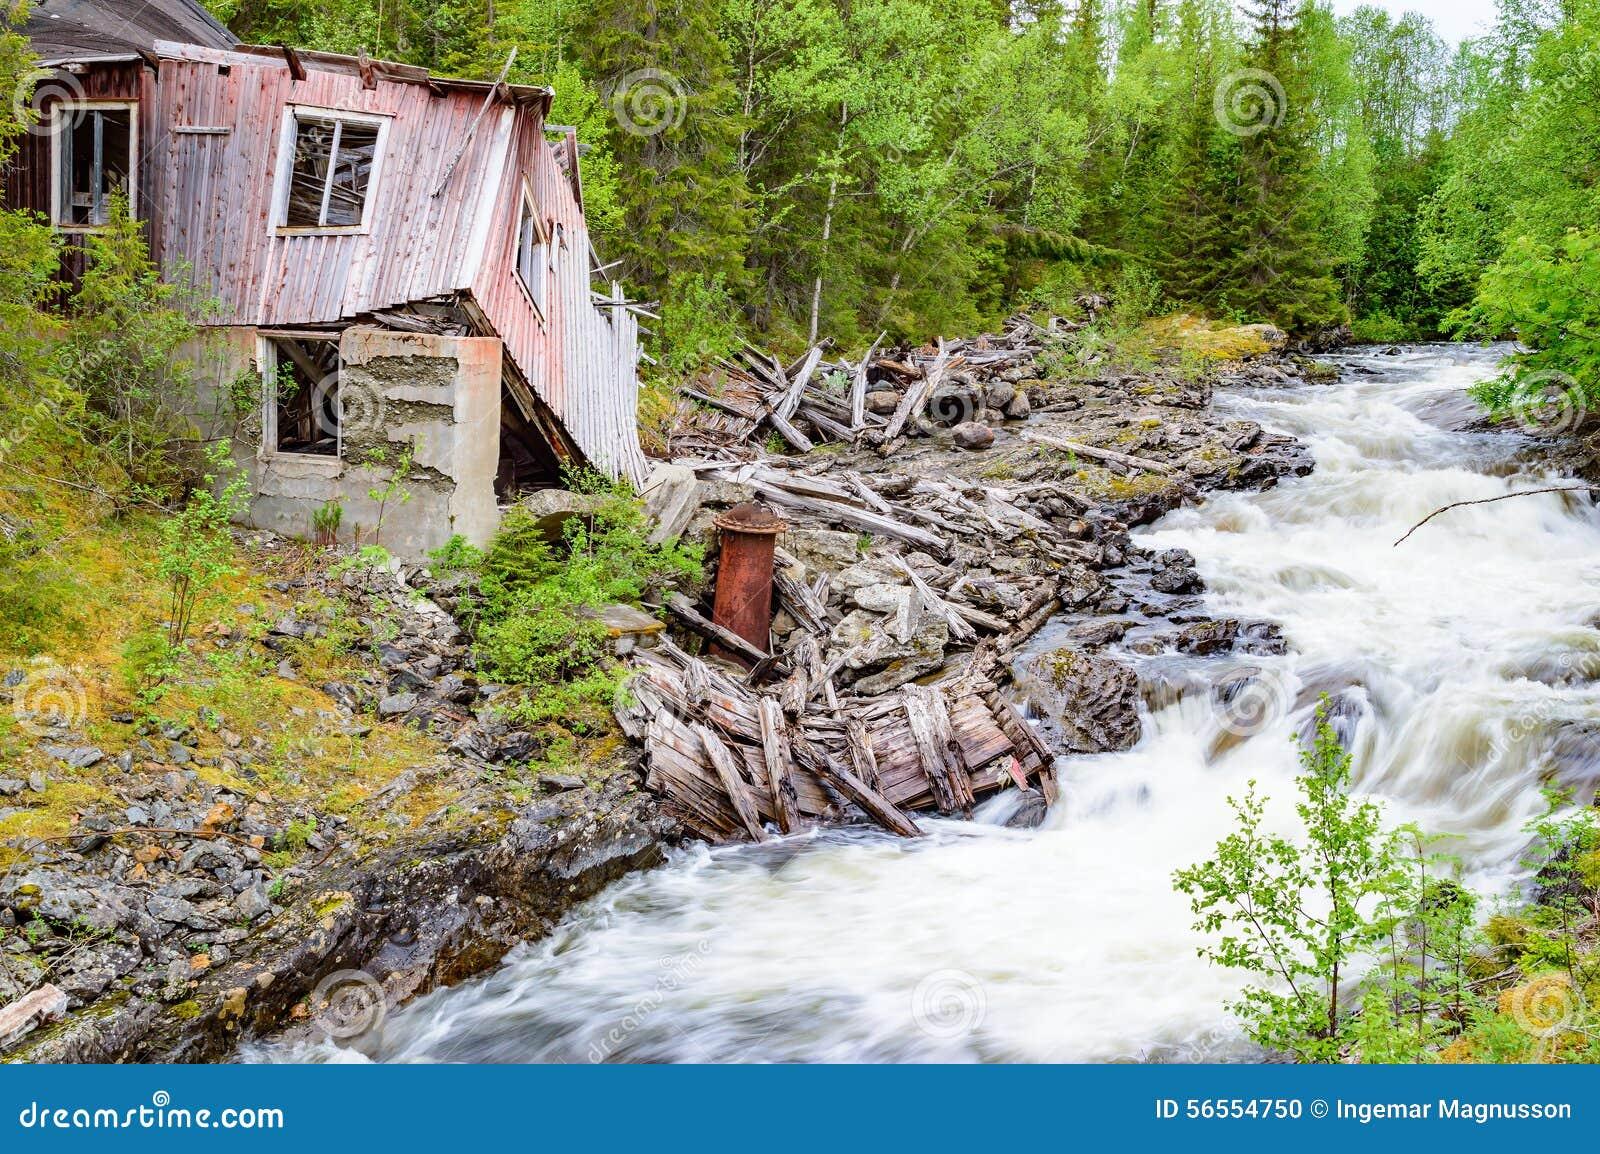 Download Καταστροφή κοντά στον ποταμό Στοκ Εικόνες - εικόνα από ζημία, πάρτε: 56554750